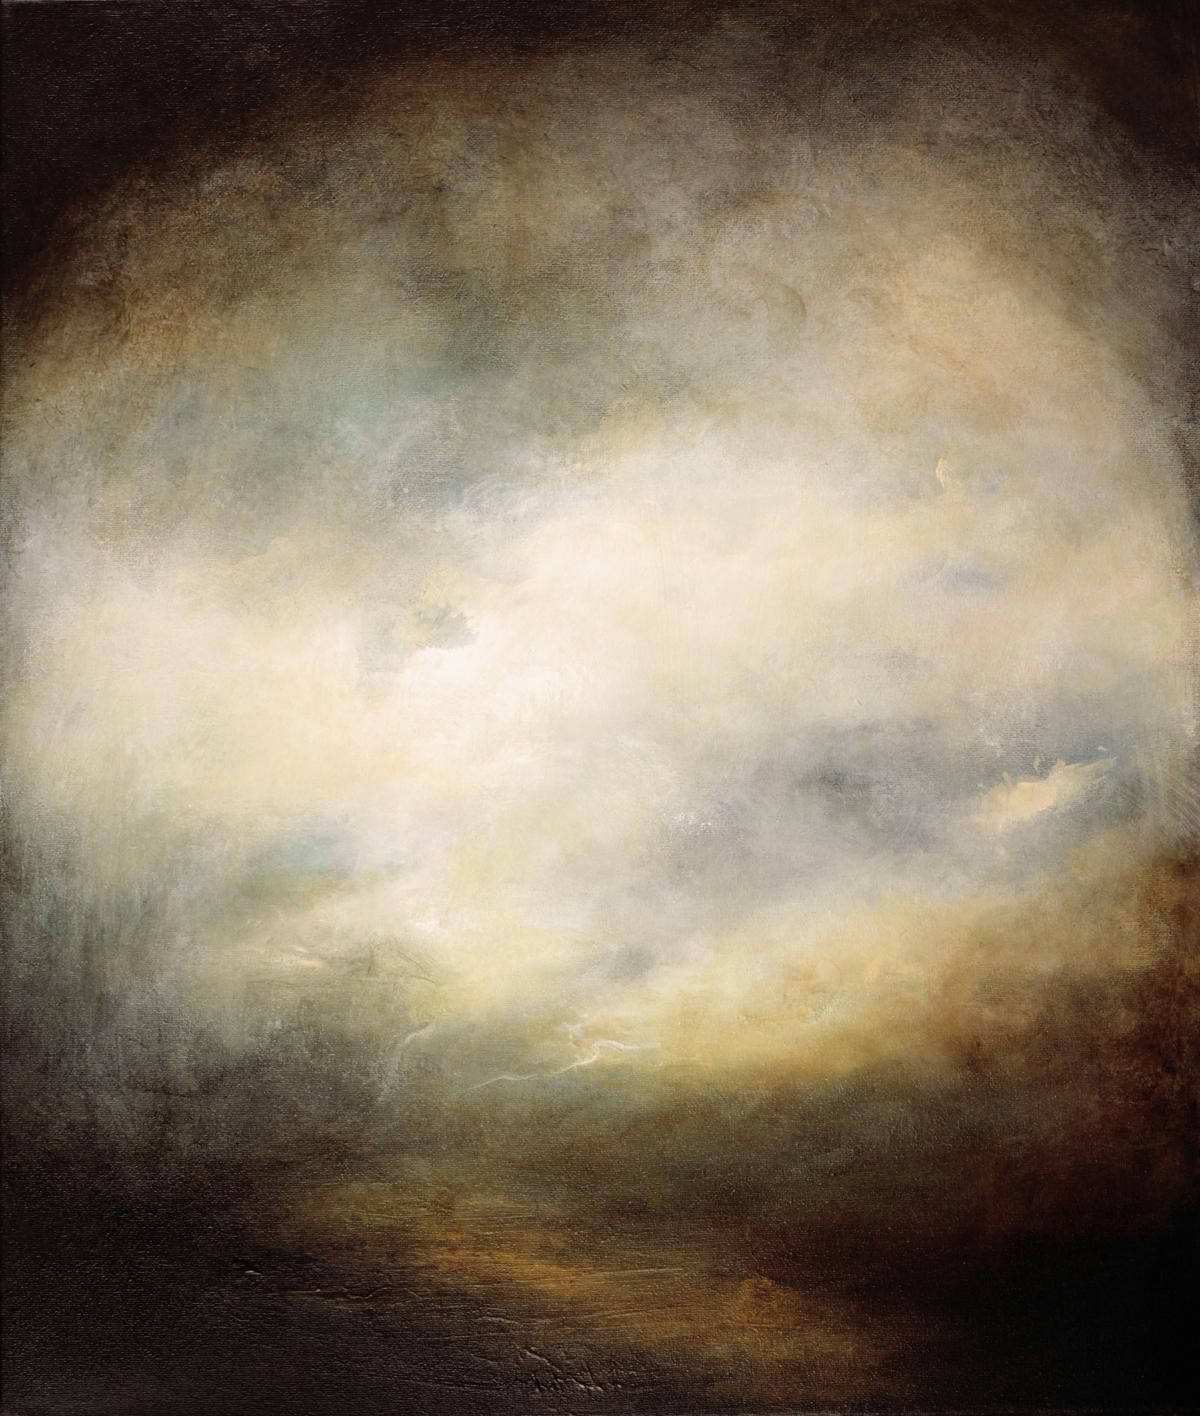 Kerr Ashmore - Prelude  - 54 x 65 cms - Acrylic on Canvas - Landscape painting - Landscape - Art.jpg